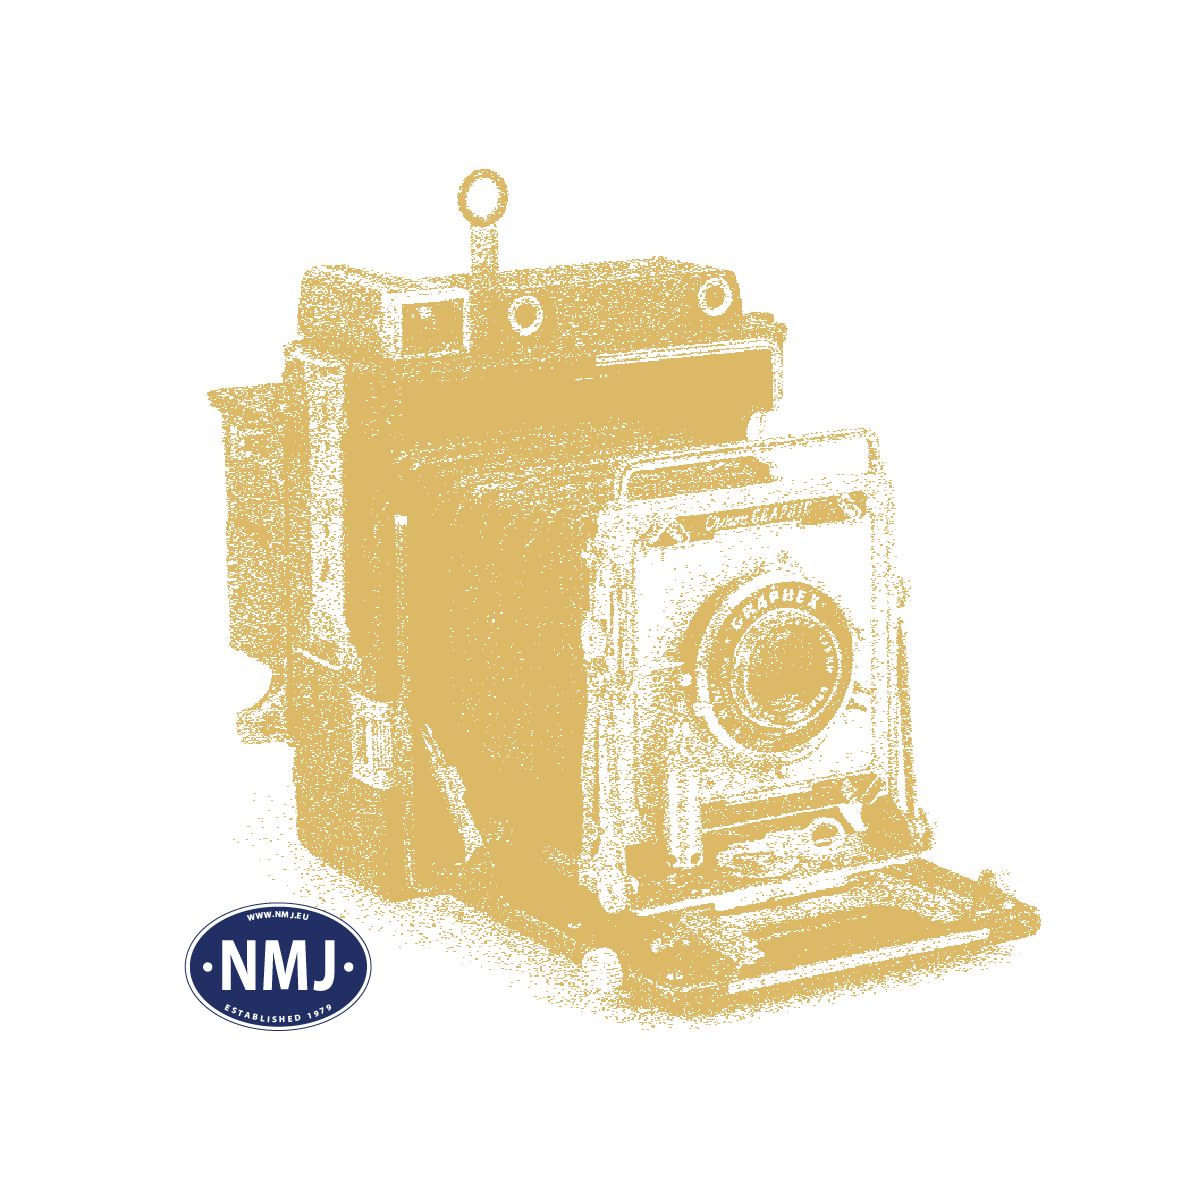 NMJT94102 - NMJ Topline NSB El14 2182, Gammeldesign, DCC m/ Lyd